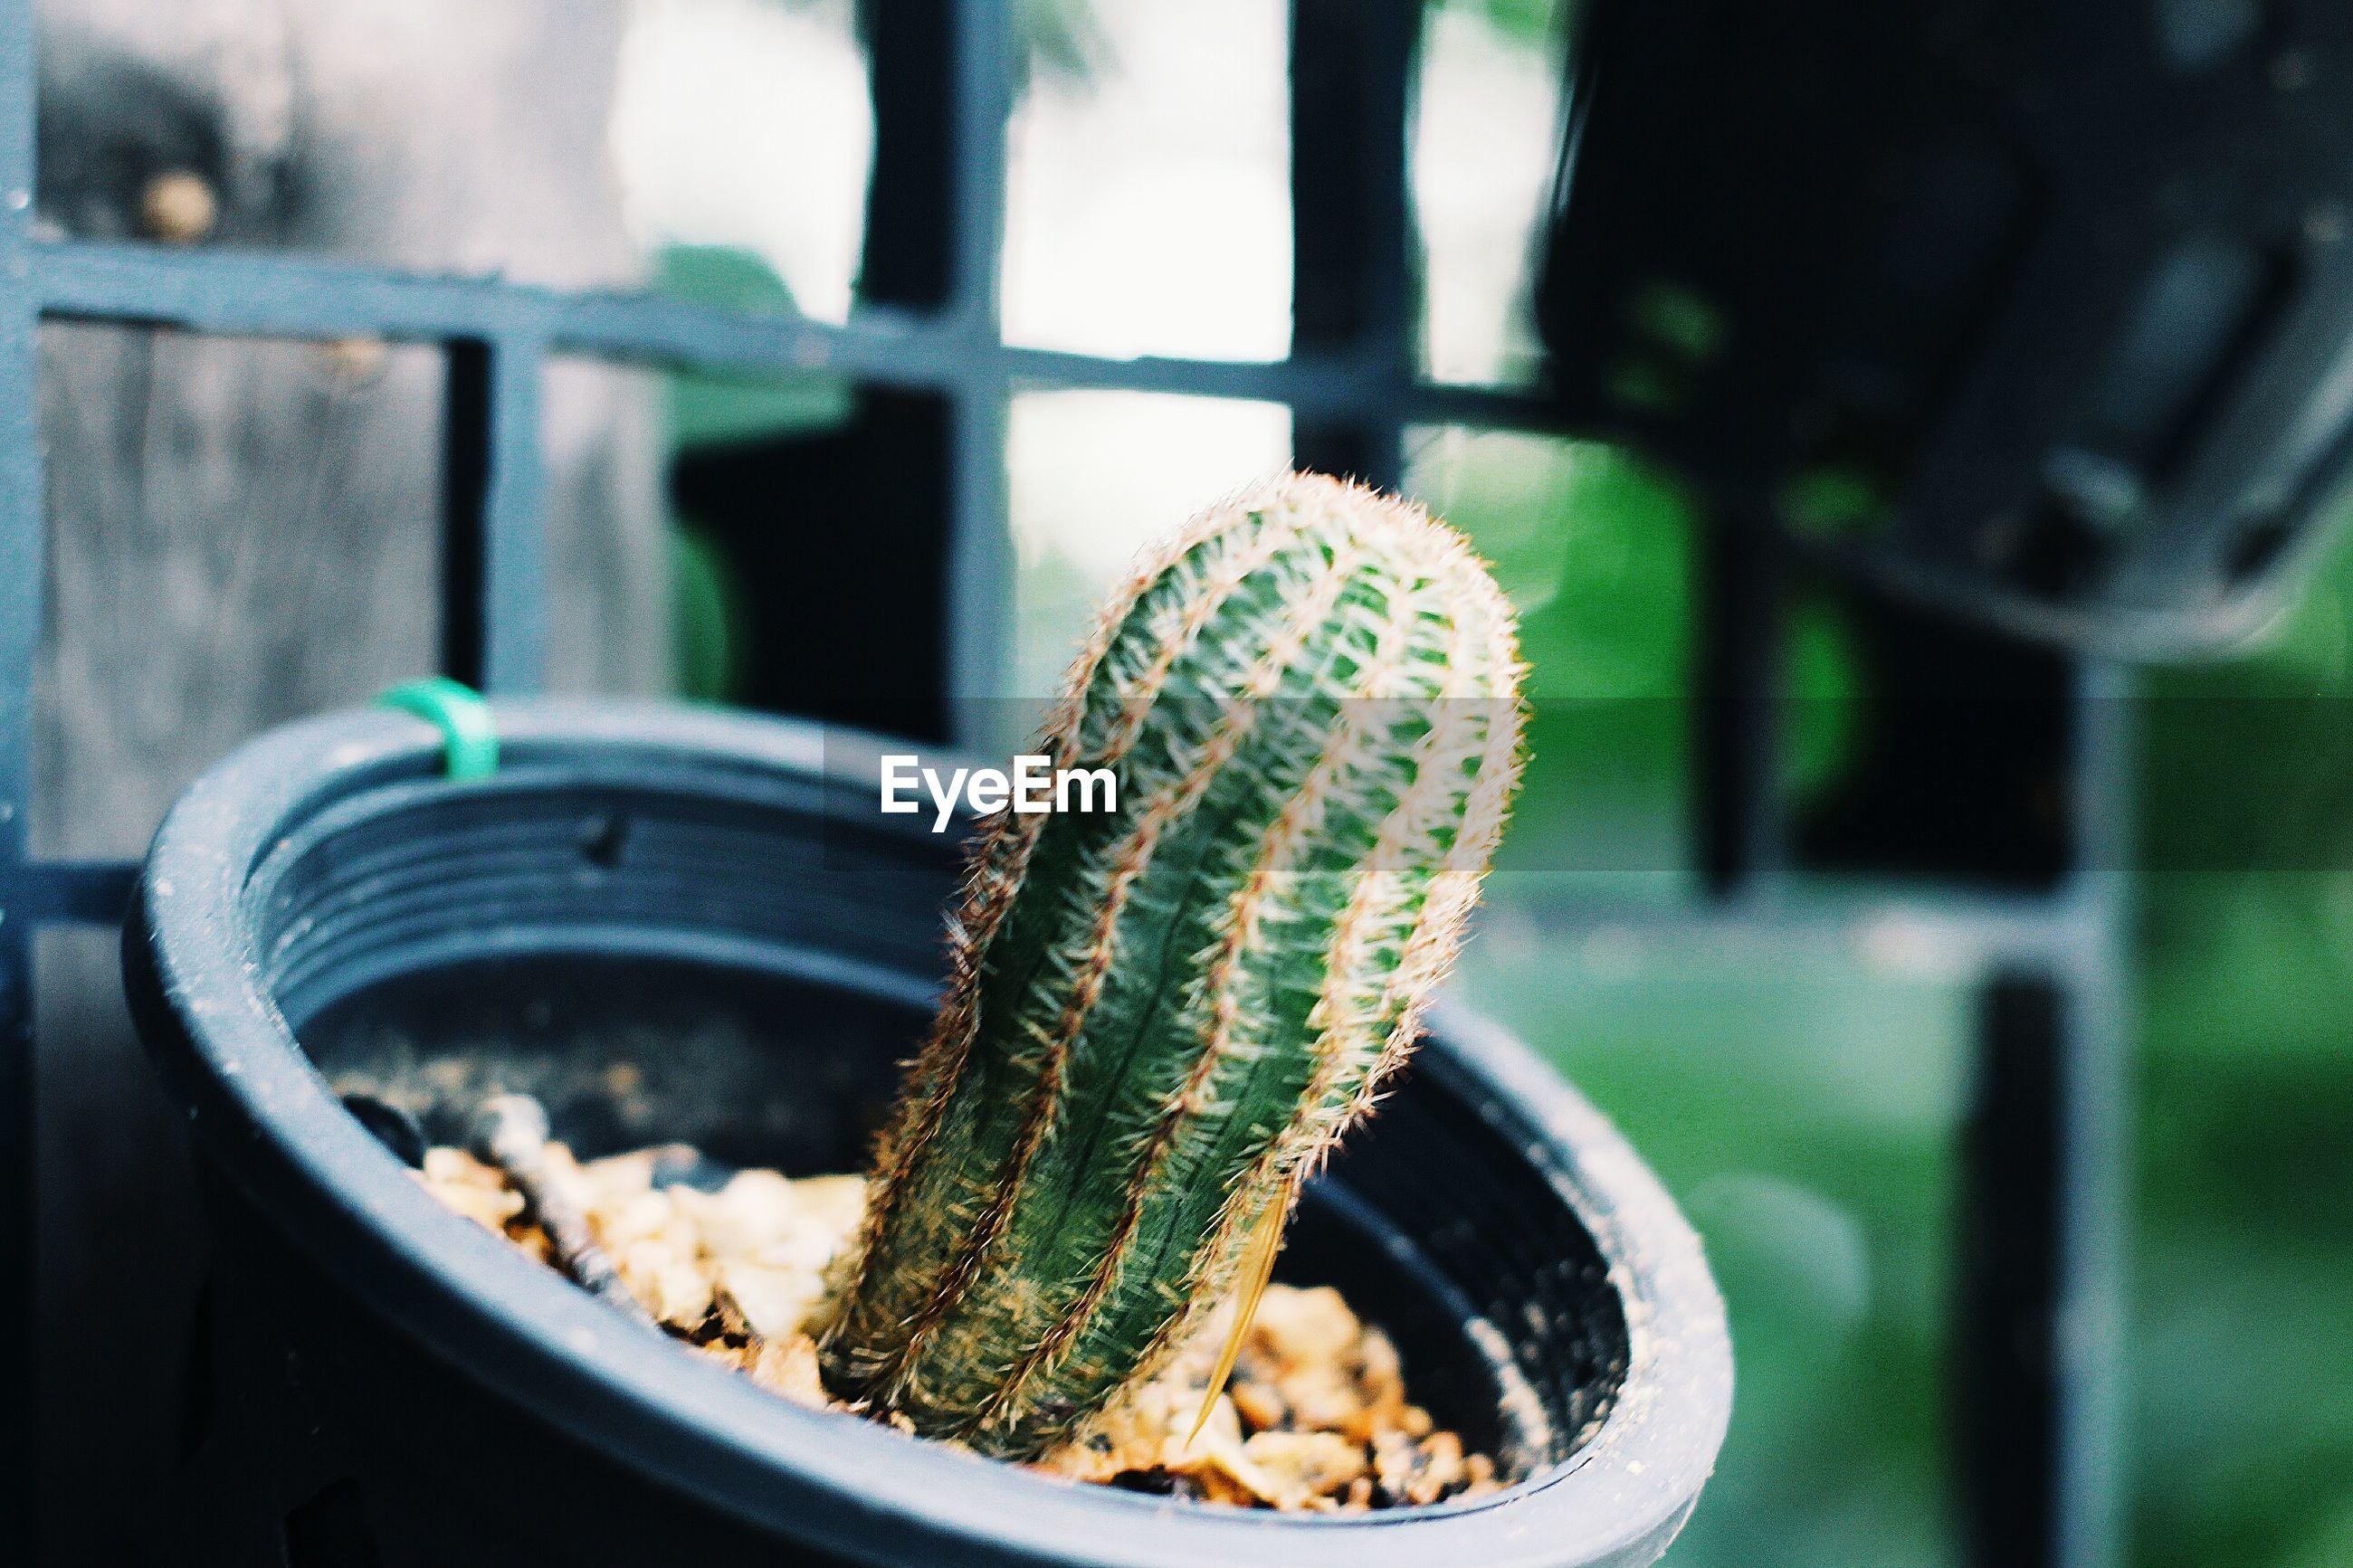 Close-up of cactus in flower pot